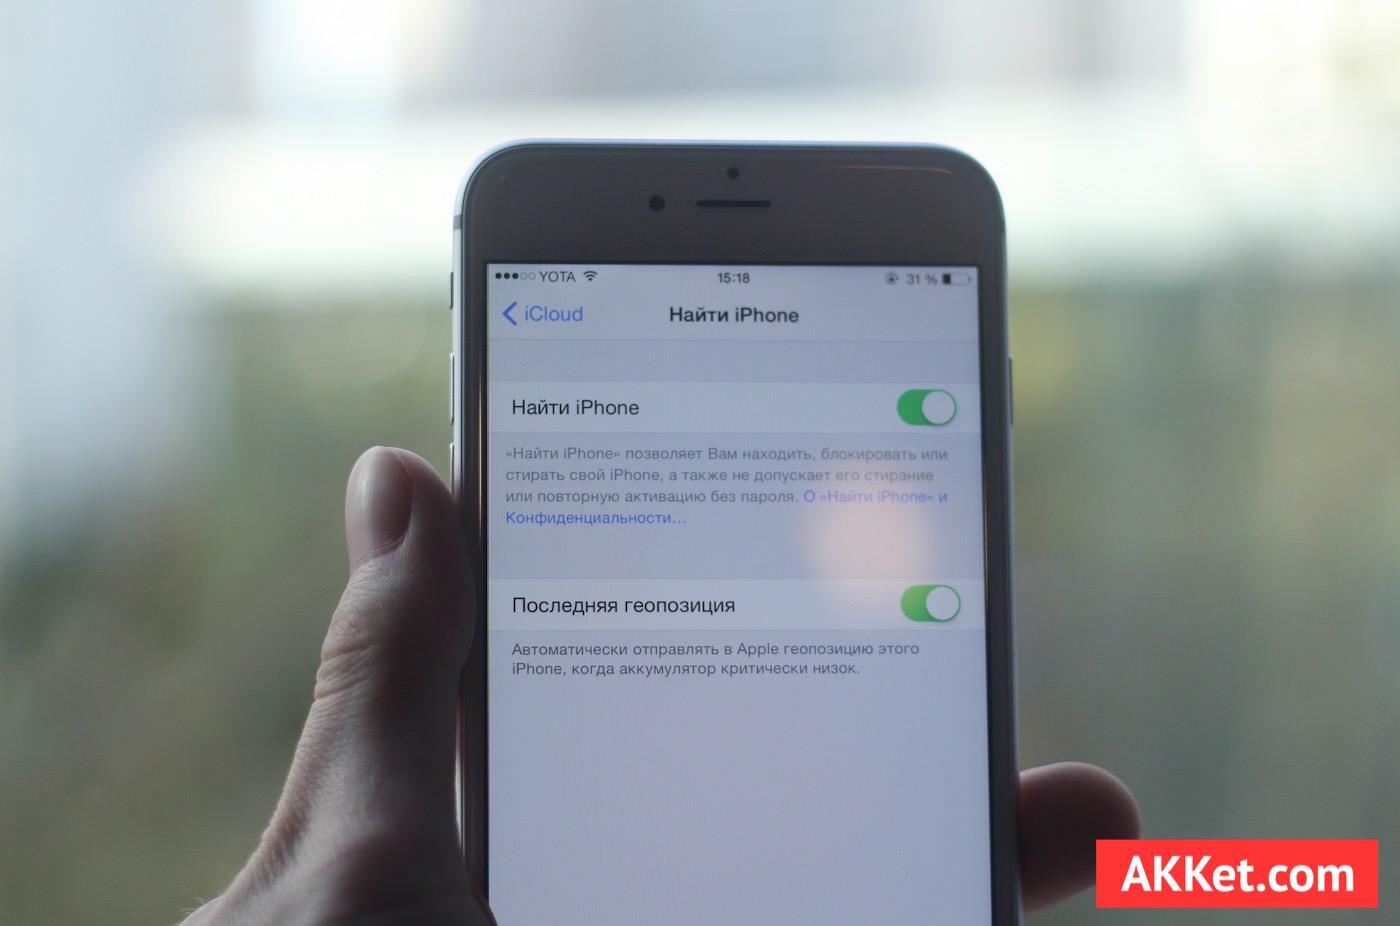 iCloud Activaion Lock 2 akket.com 2